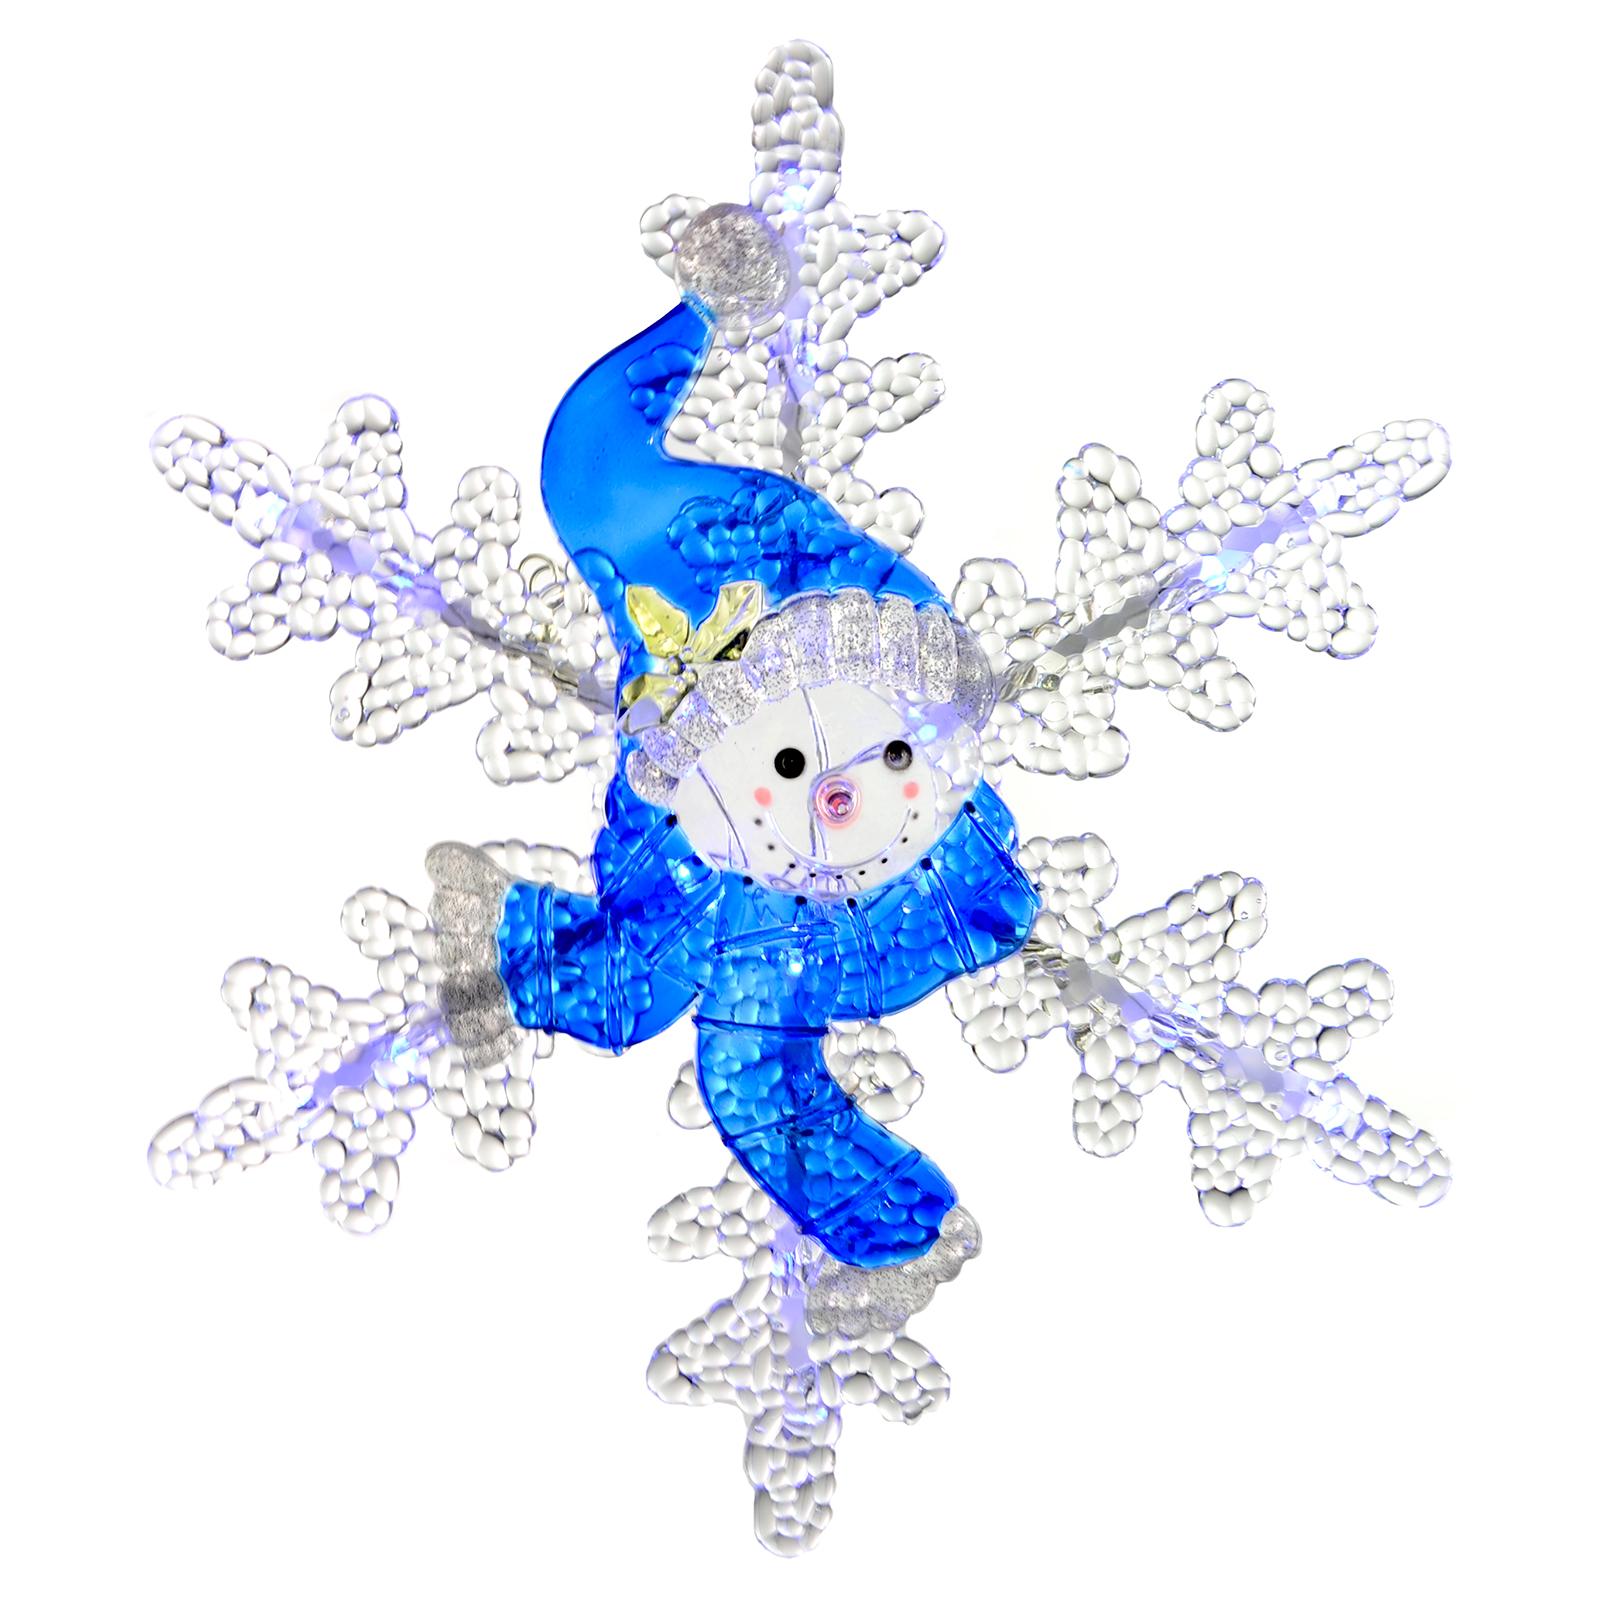 30cm Light Up LED Acrylic Snowman Snowflake Indoor